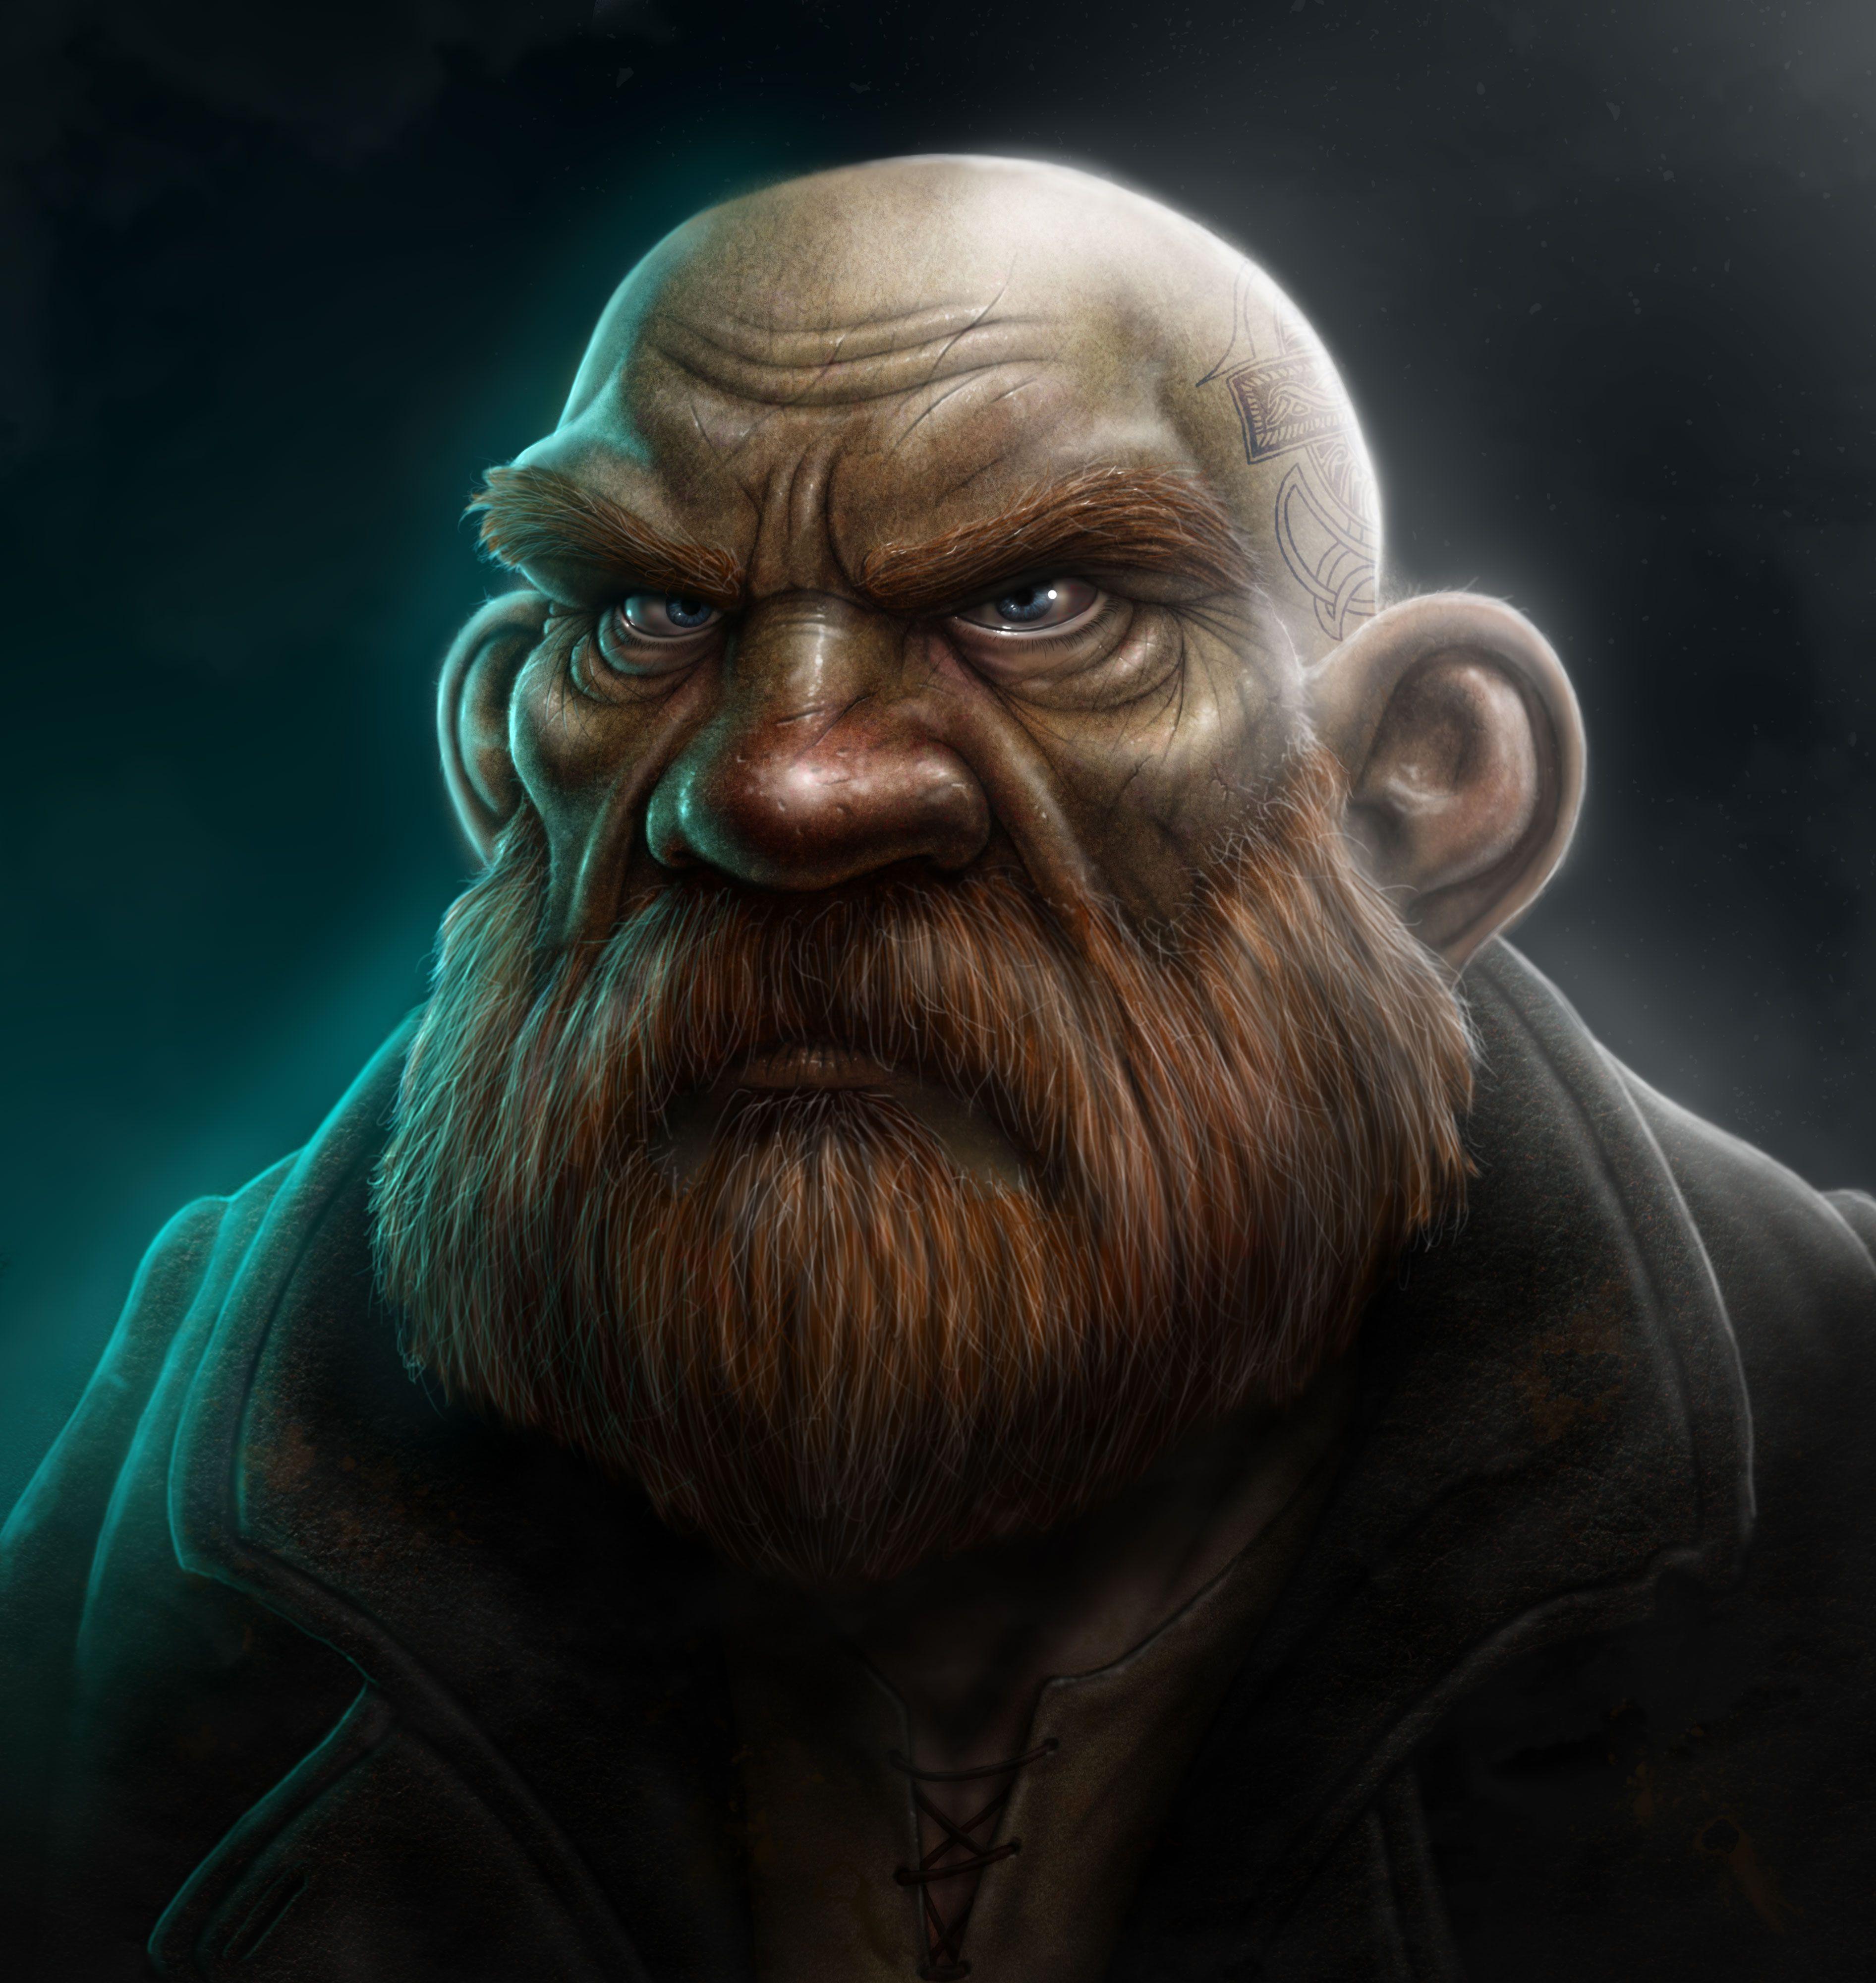 Dwarf by SaeedRamez on DeviantArt |Dwarf Male Portrait